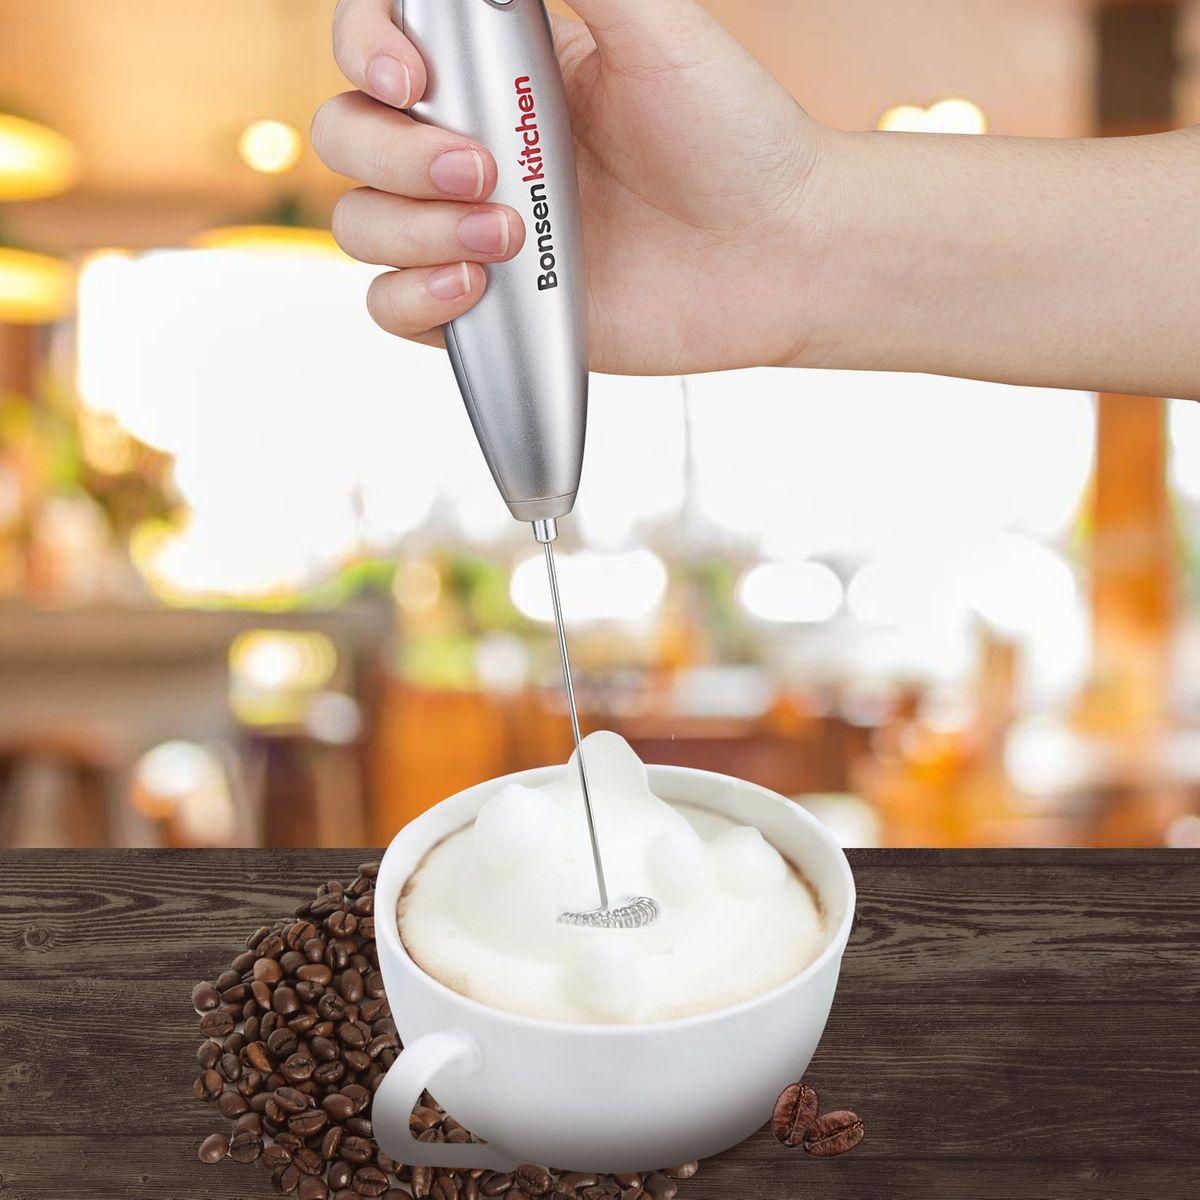 12 Best Milk Frothers 2020   The Strategist   New York Magazine